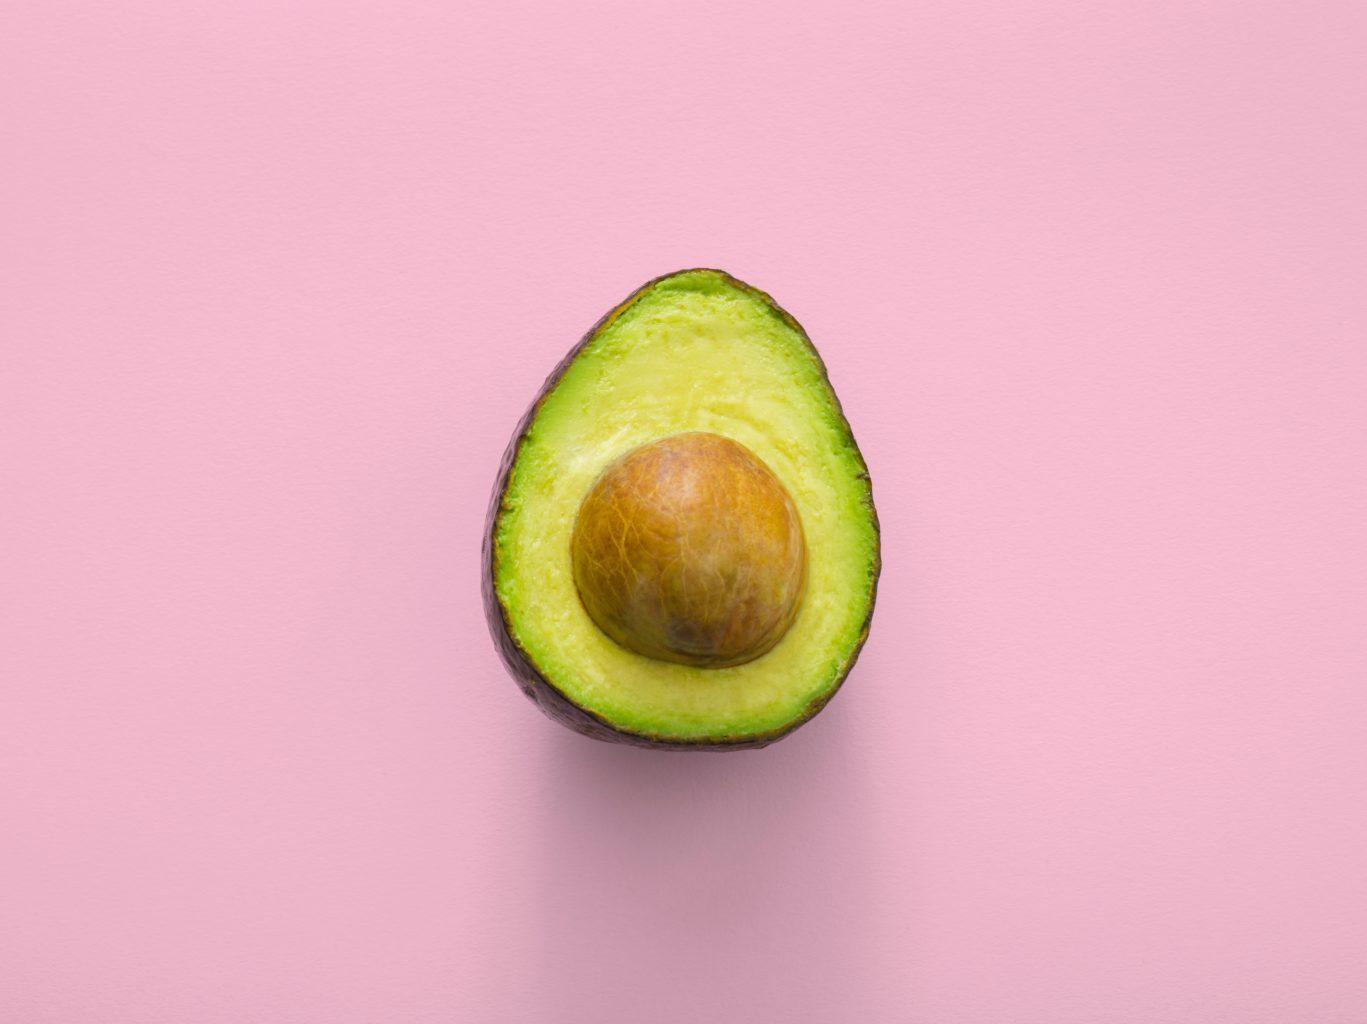 thought catalog 620865 unsplash - Avocado Nice-Cream: The Future is Now